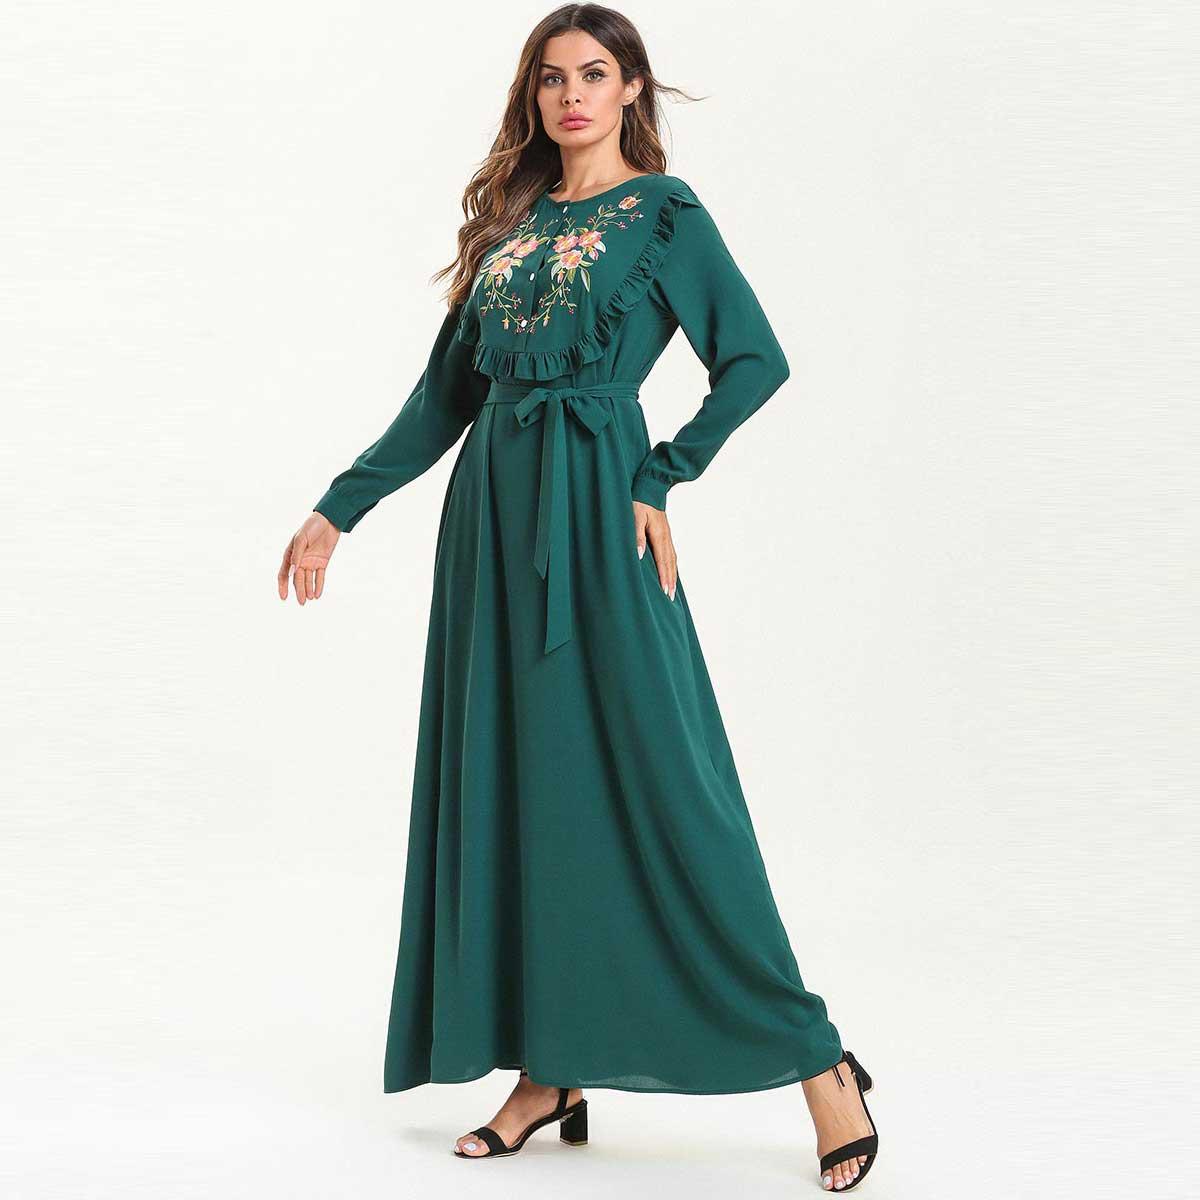 2019 Summer Ruffle Lace Up Embroidery Bohemian Maxi Dress Plus Size Women Muslim Abaya Dubai Arab UAE Dressing Gowns VKDR1594